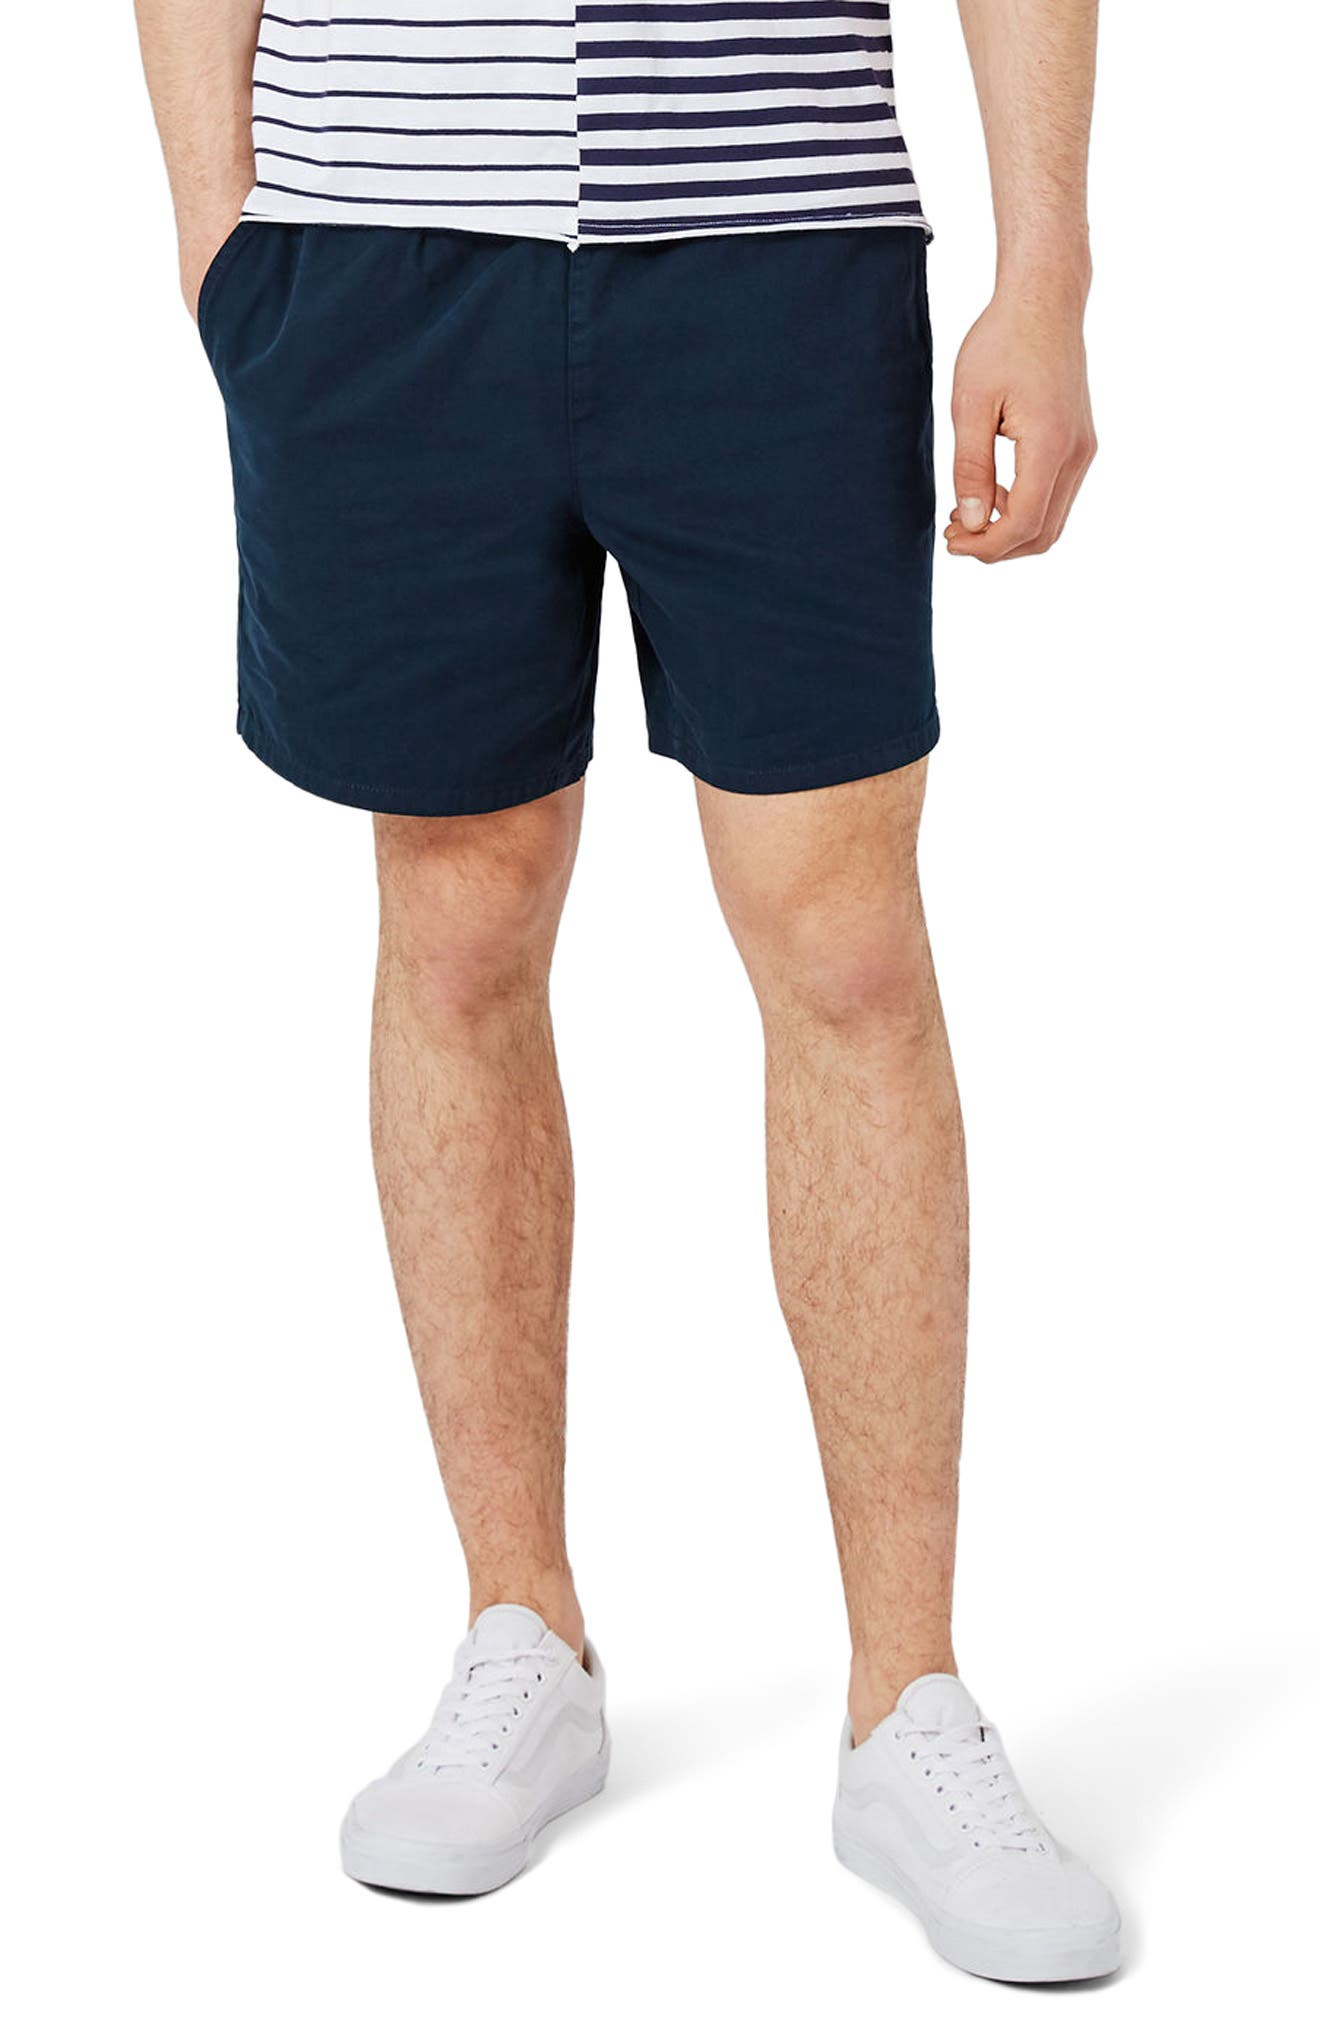 Topman Canvas Shorts